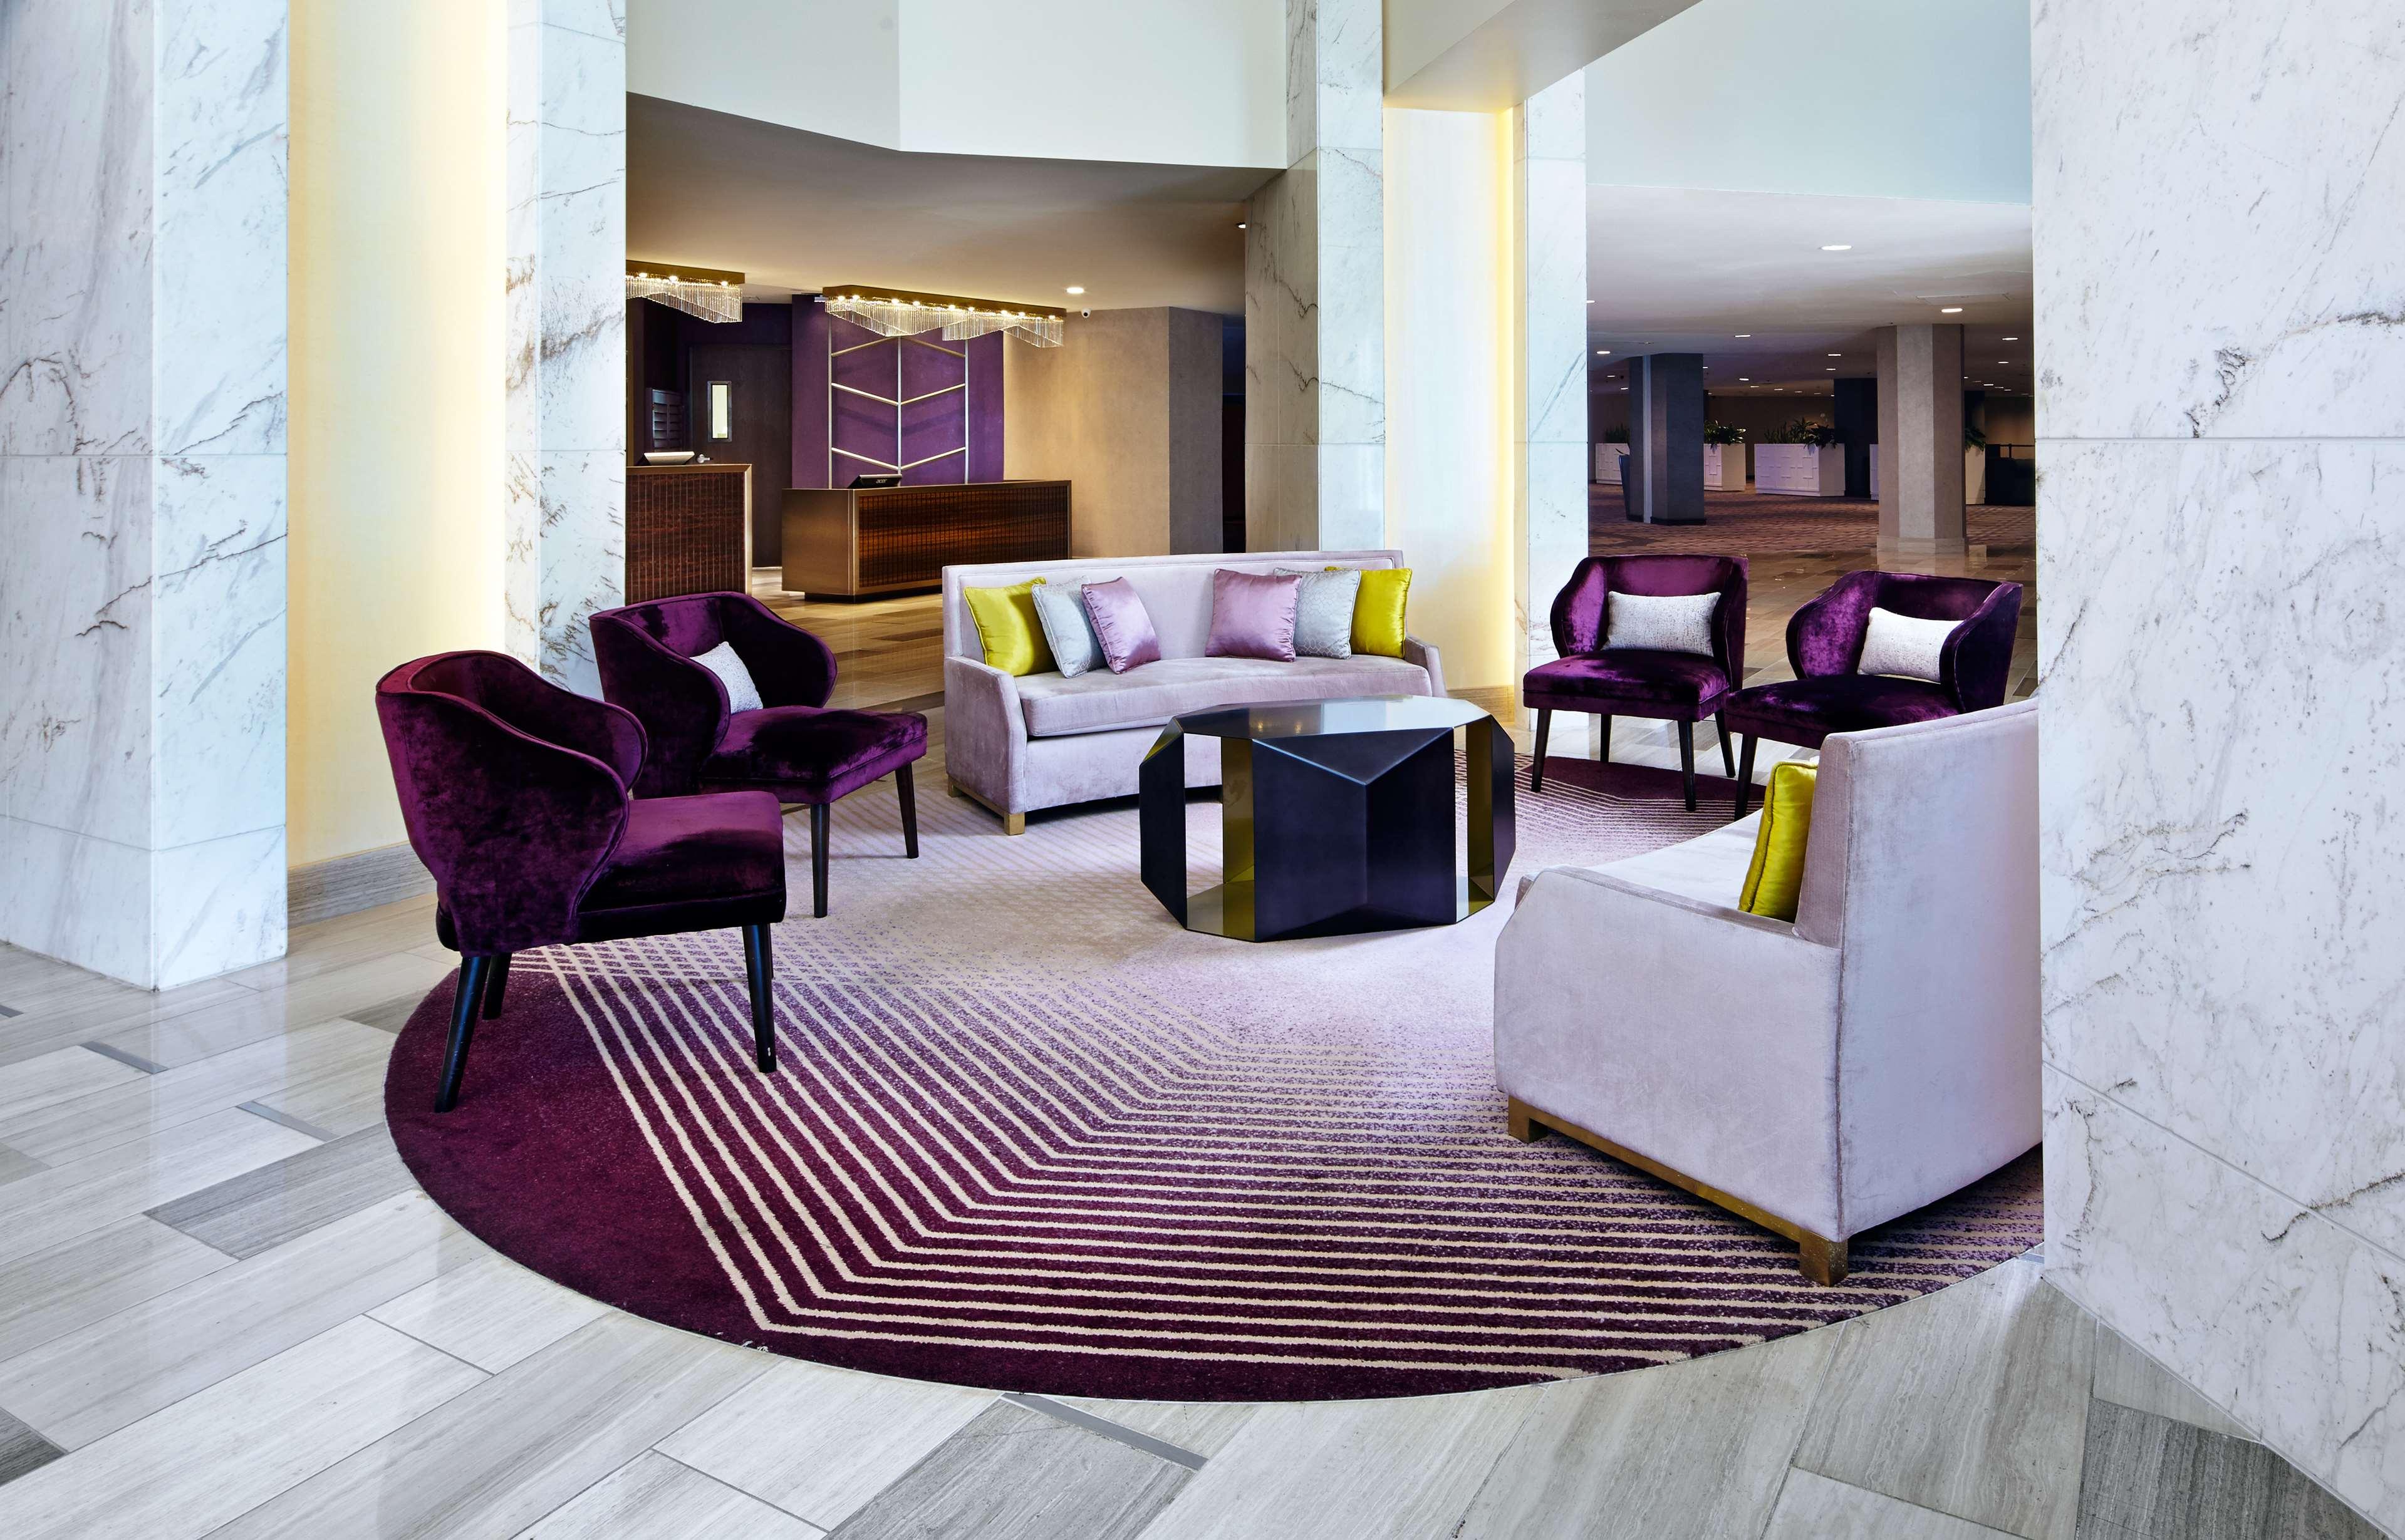 Sheraton Gateway Los Angeles Hotel image 2